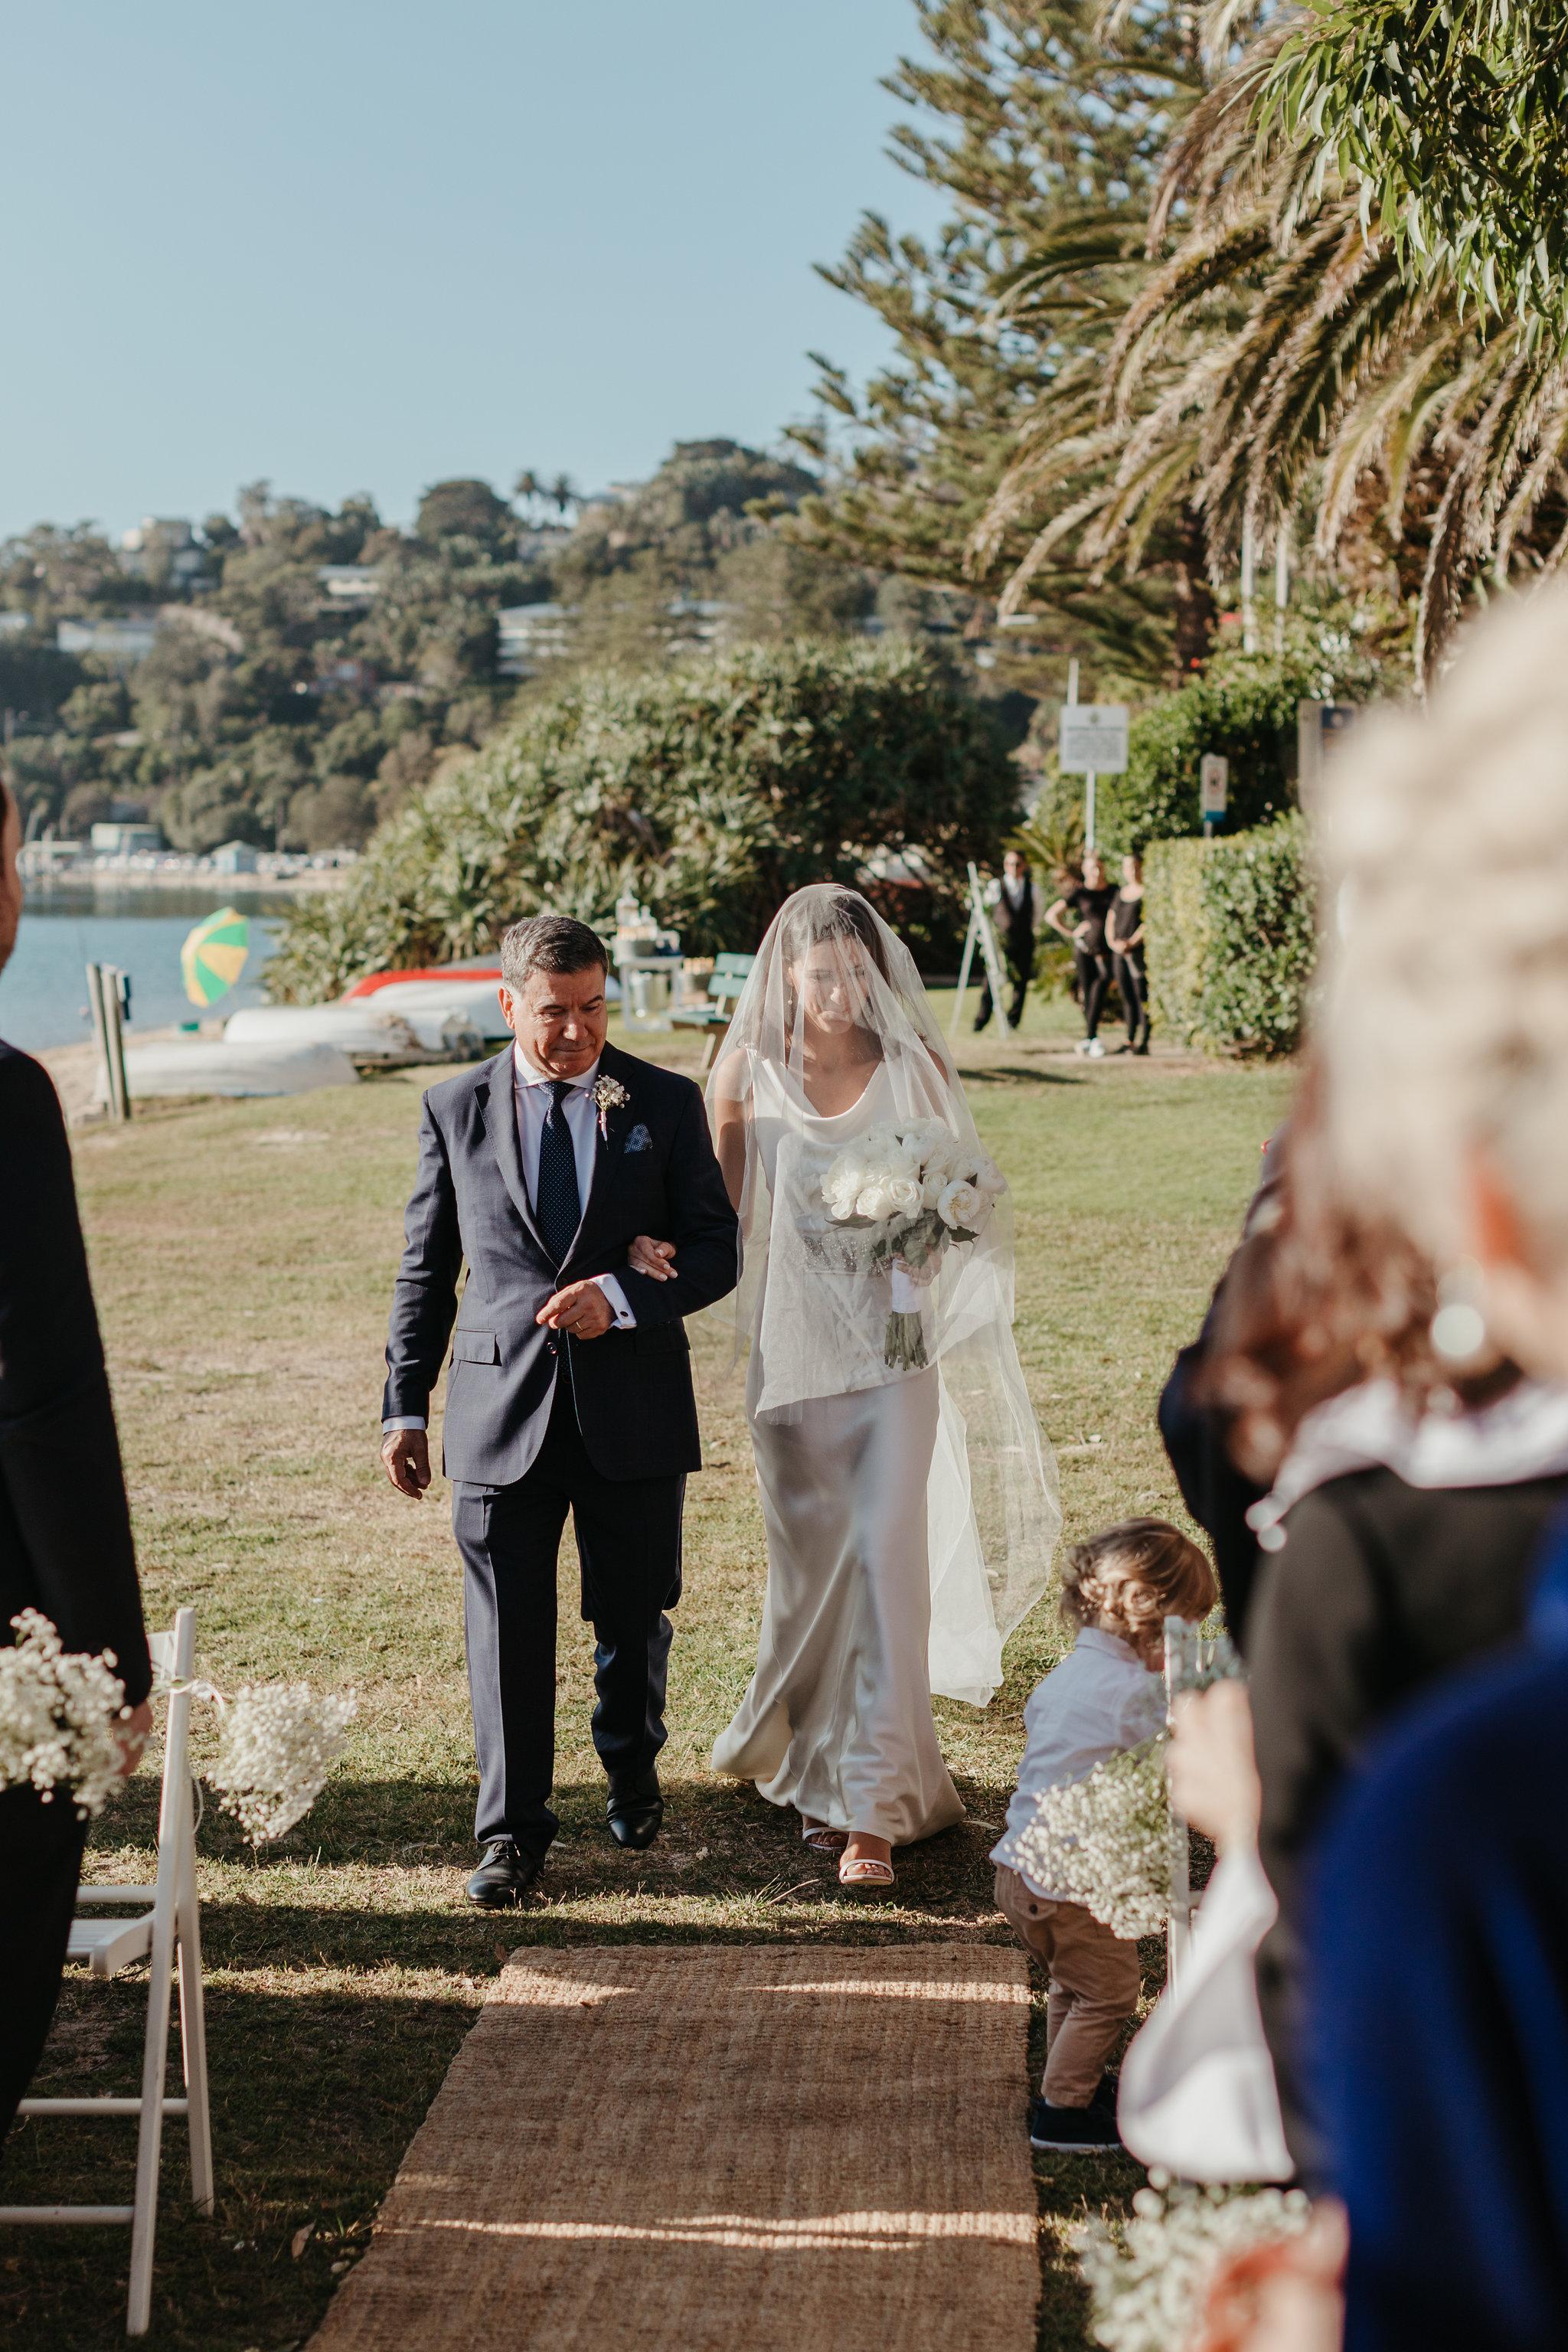 gen_chris_story_of_us_wedding-0241.JPG